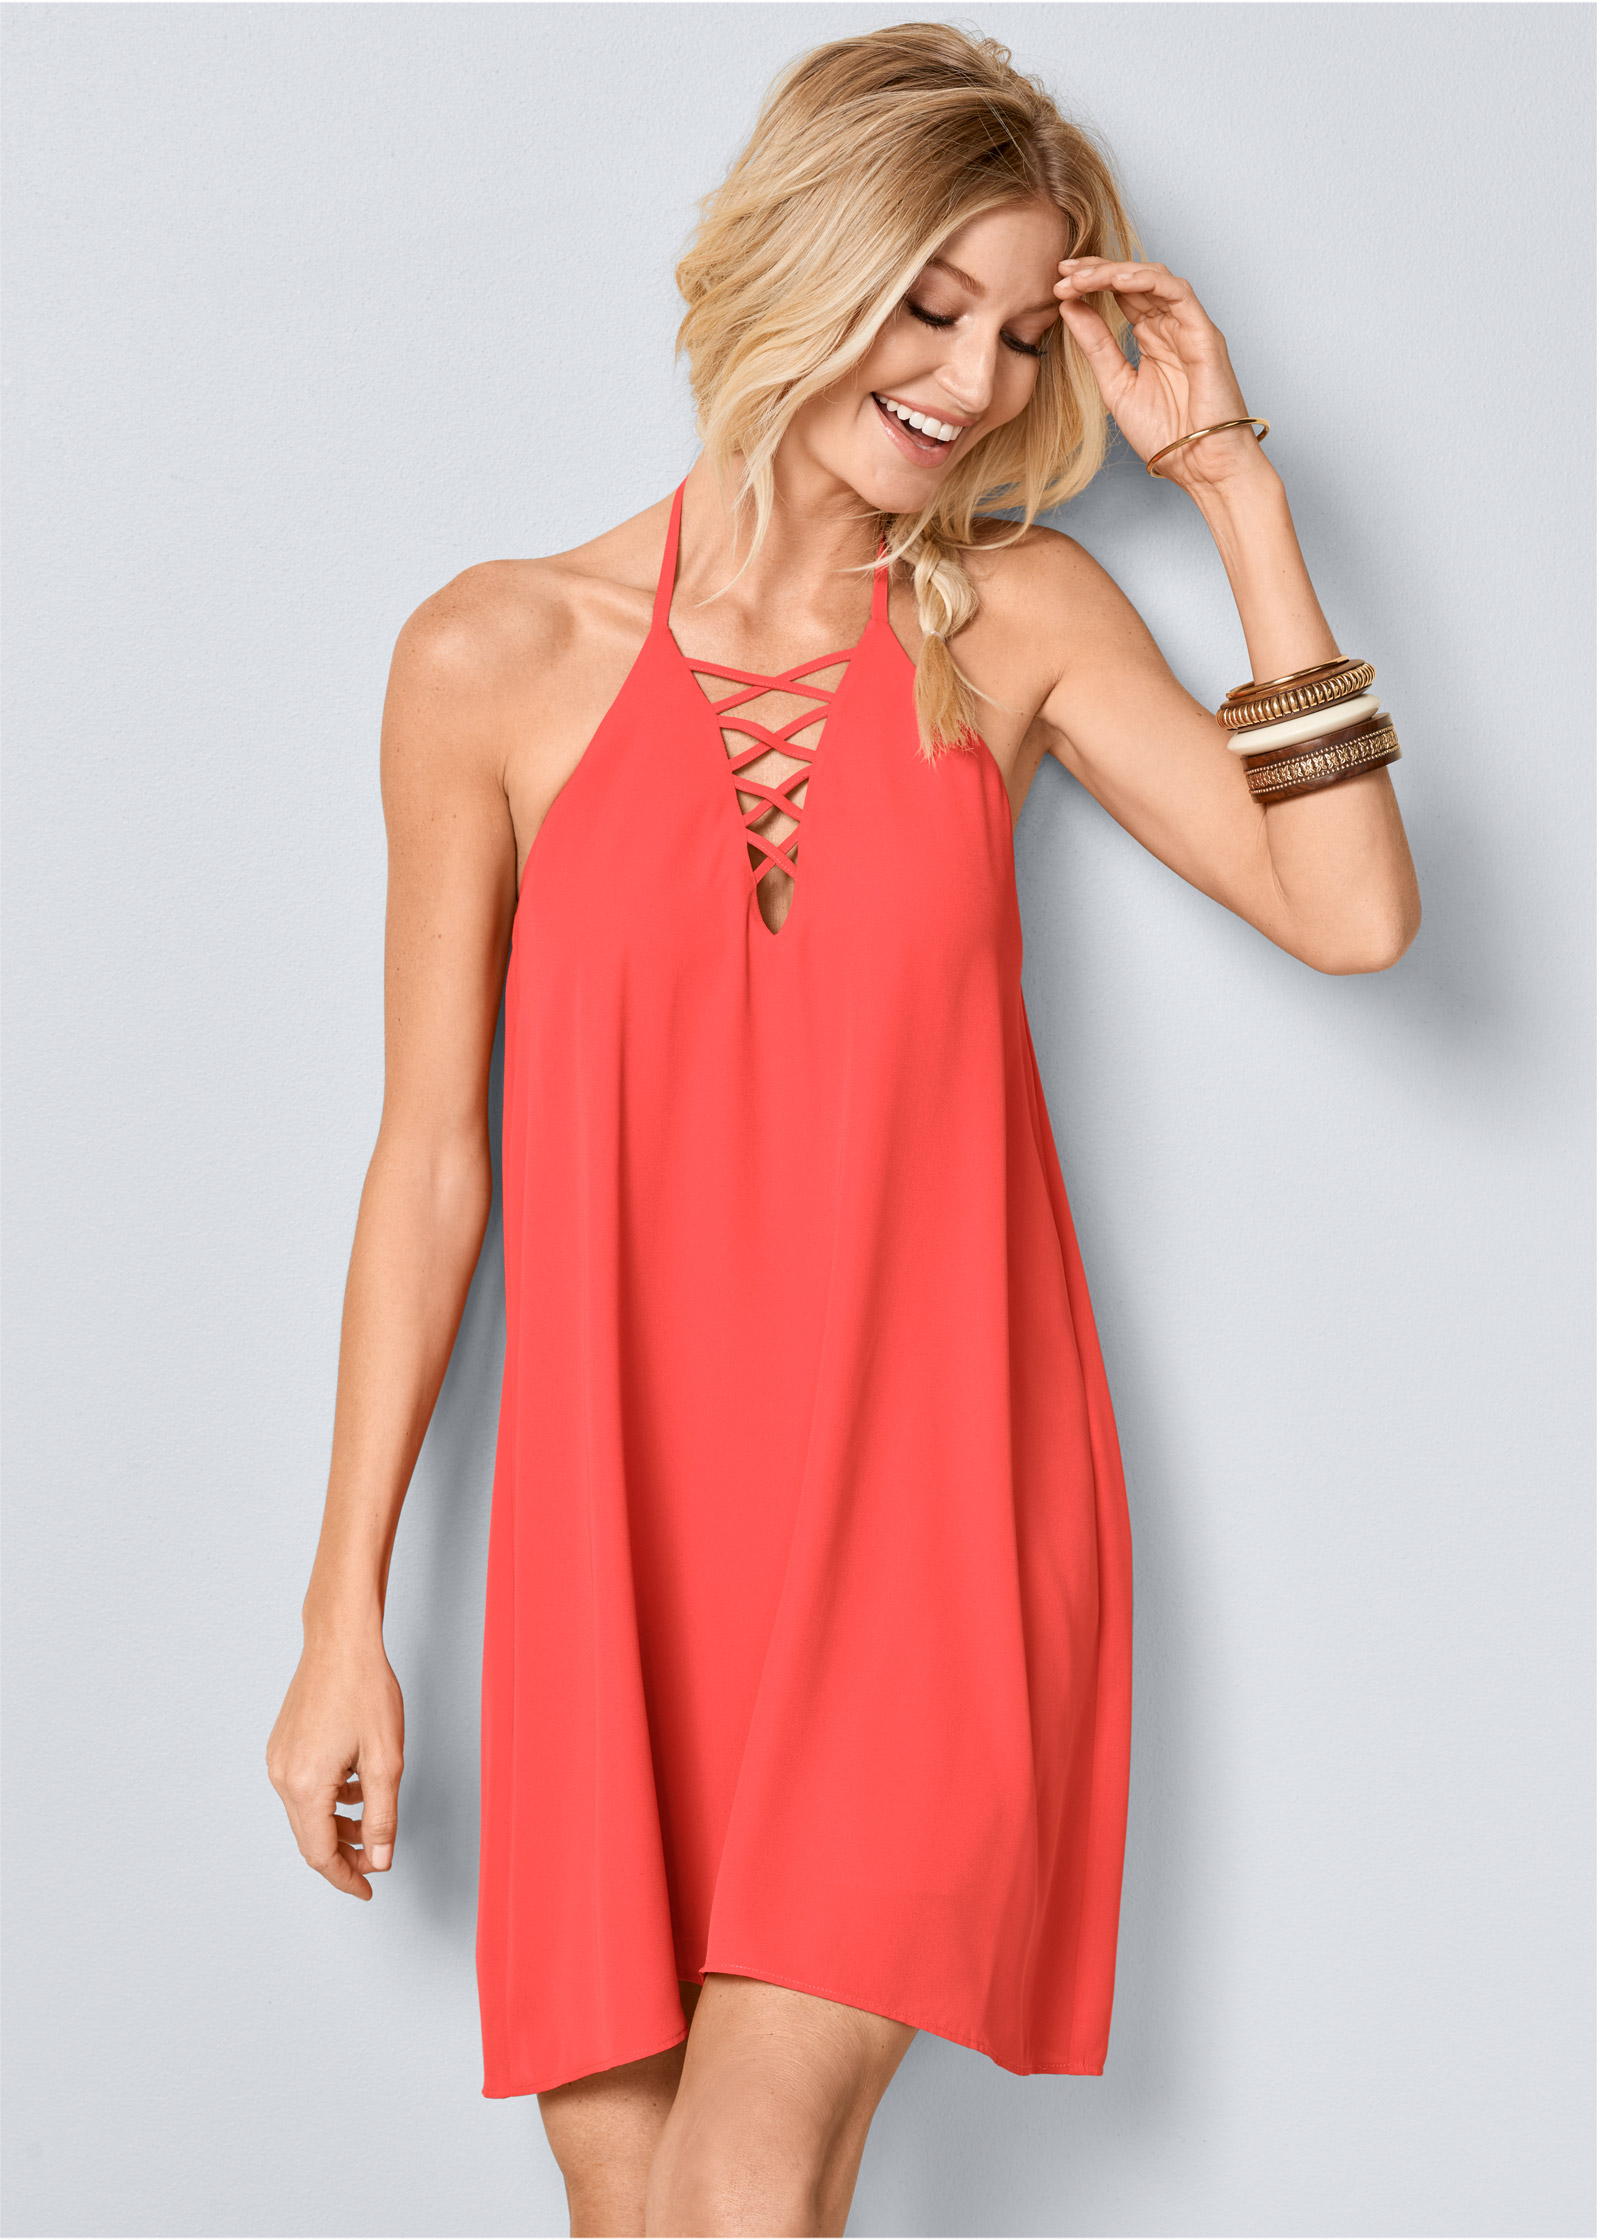 Colorful Summer Dresses On Sale